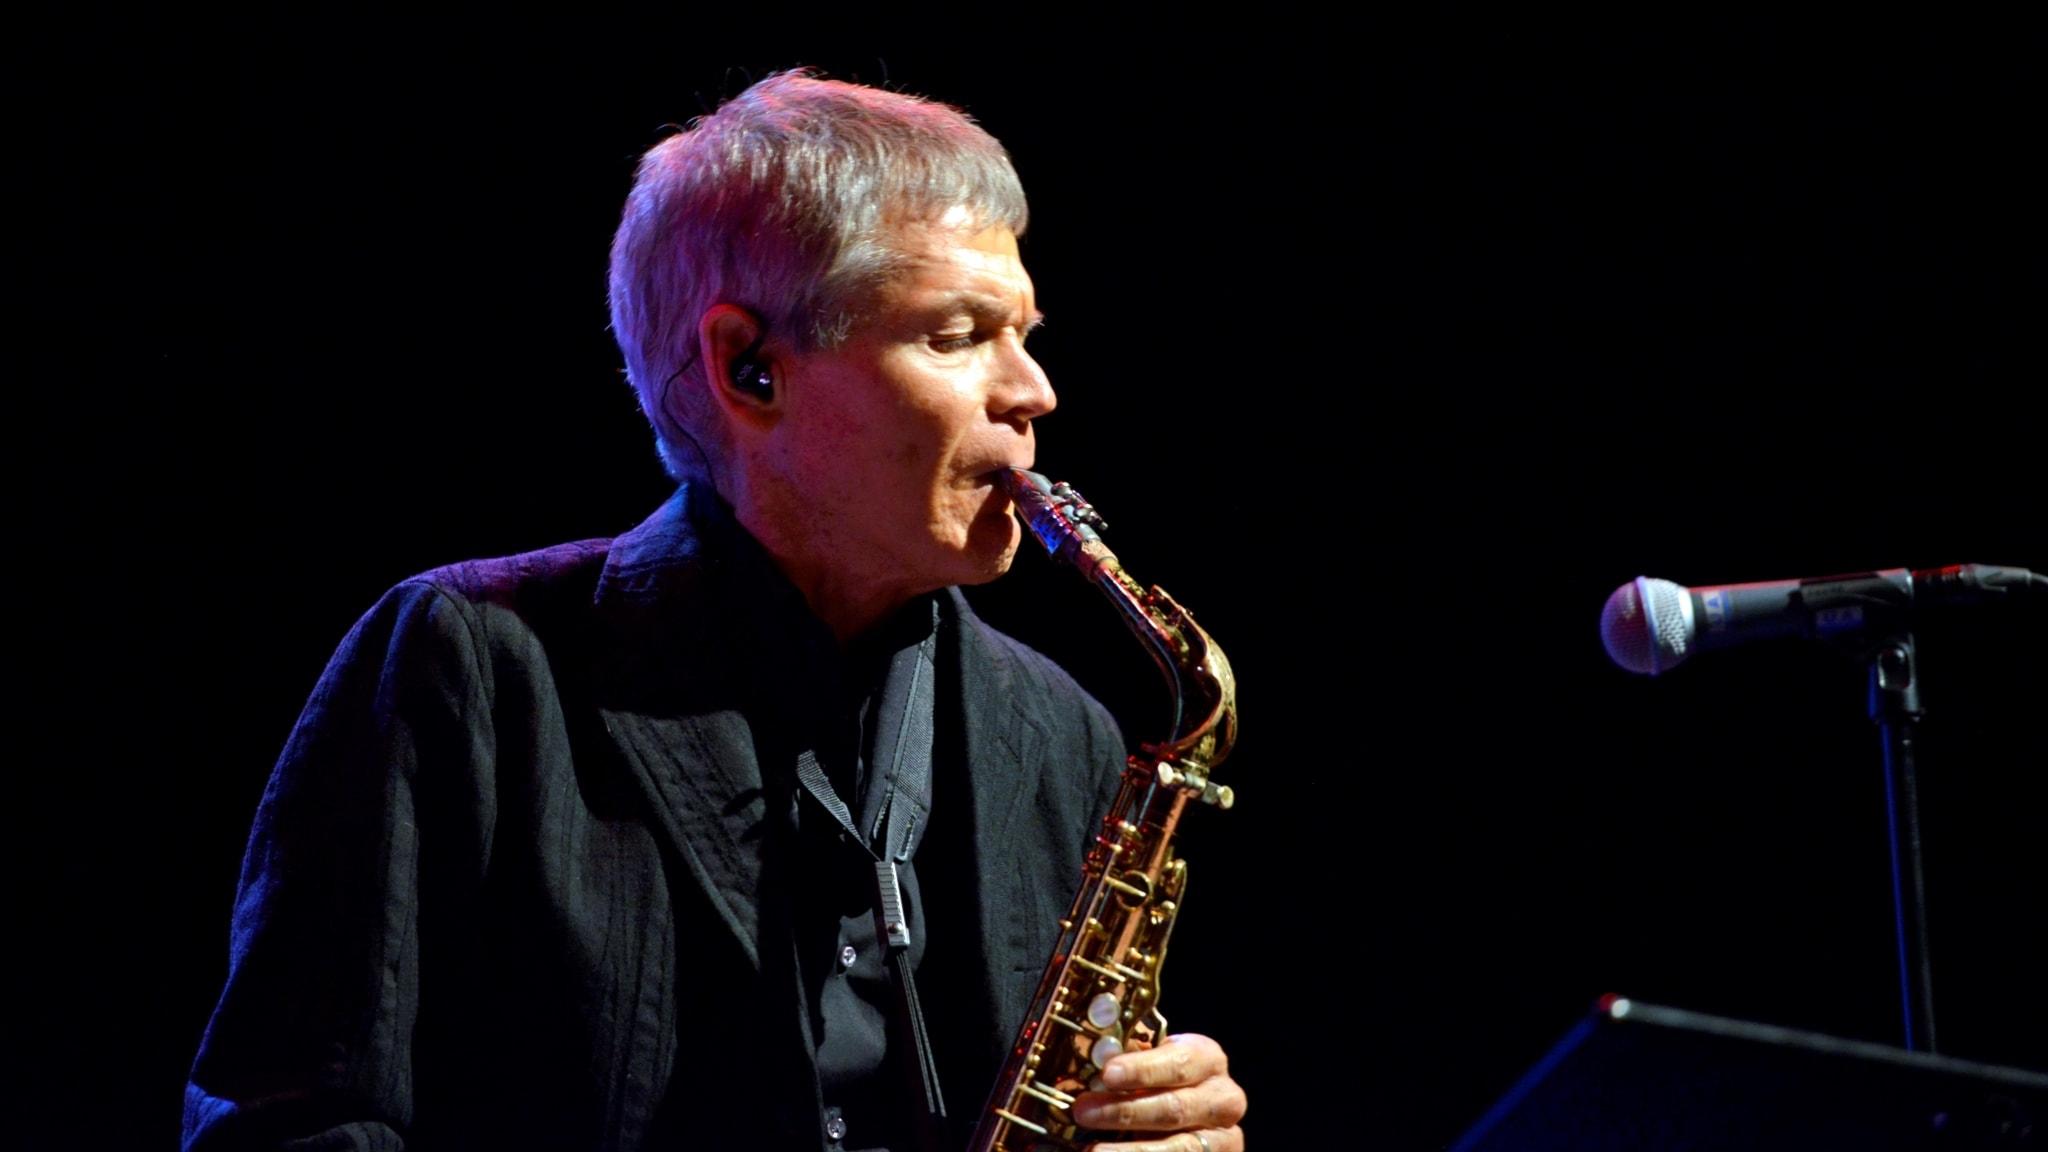 David Sunborn